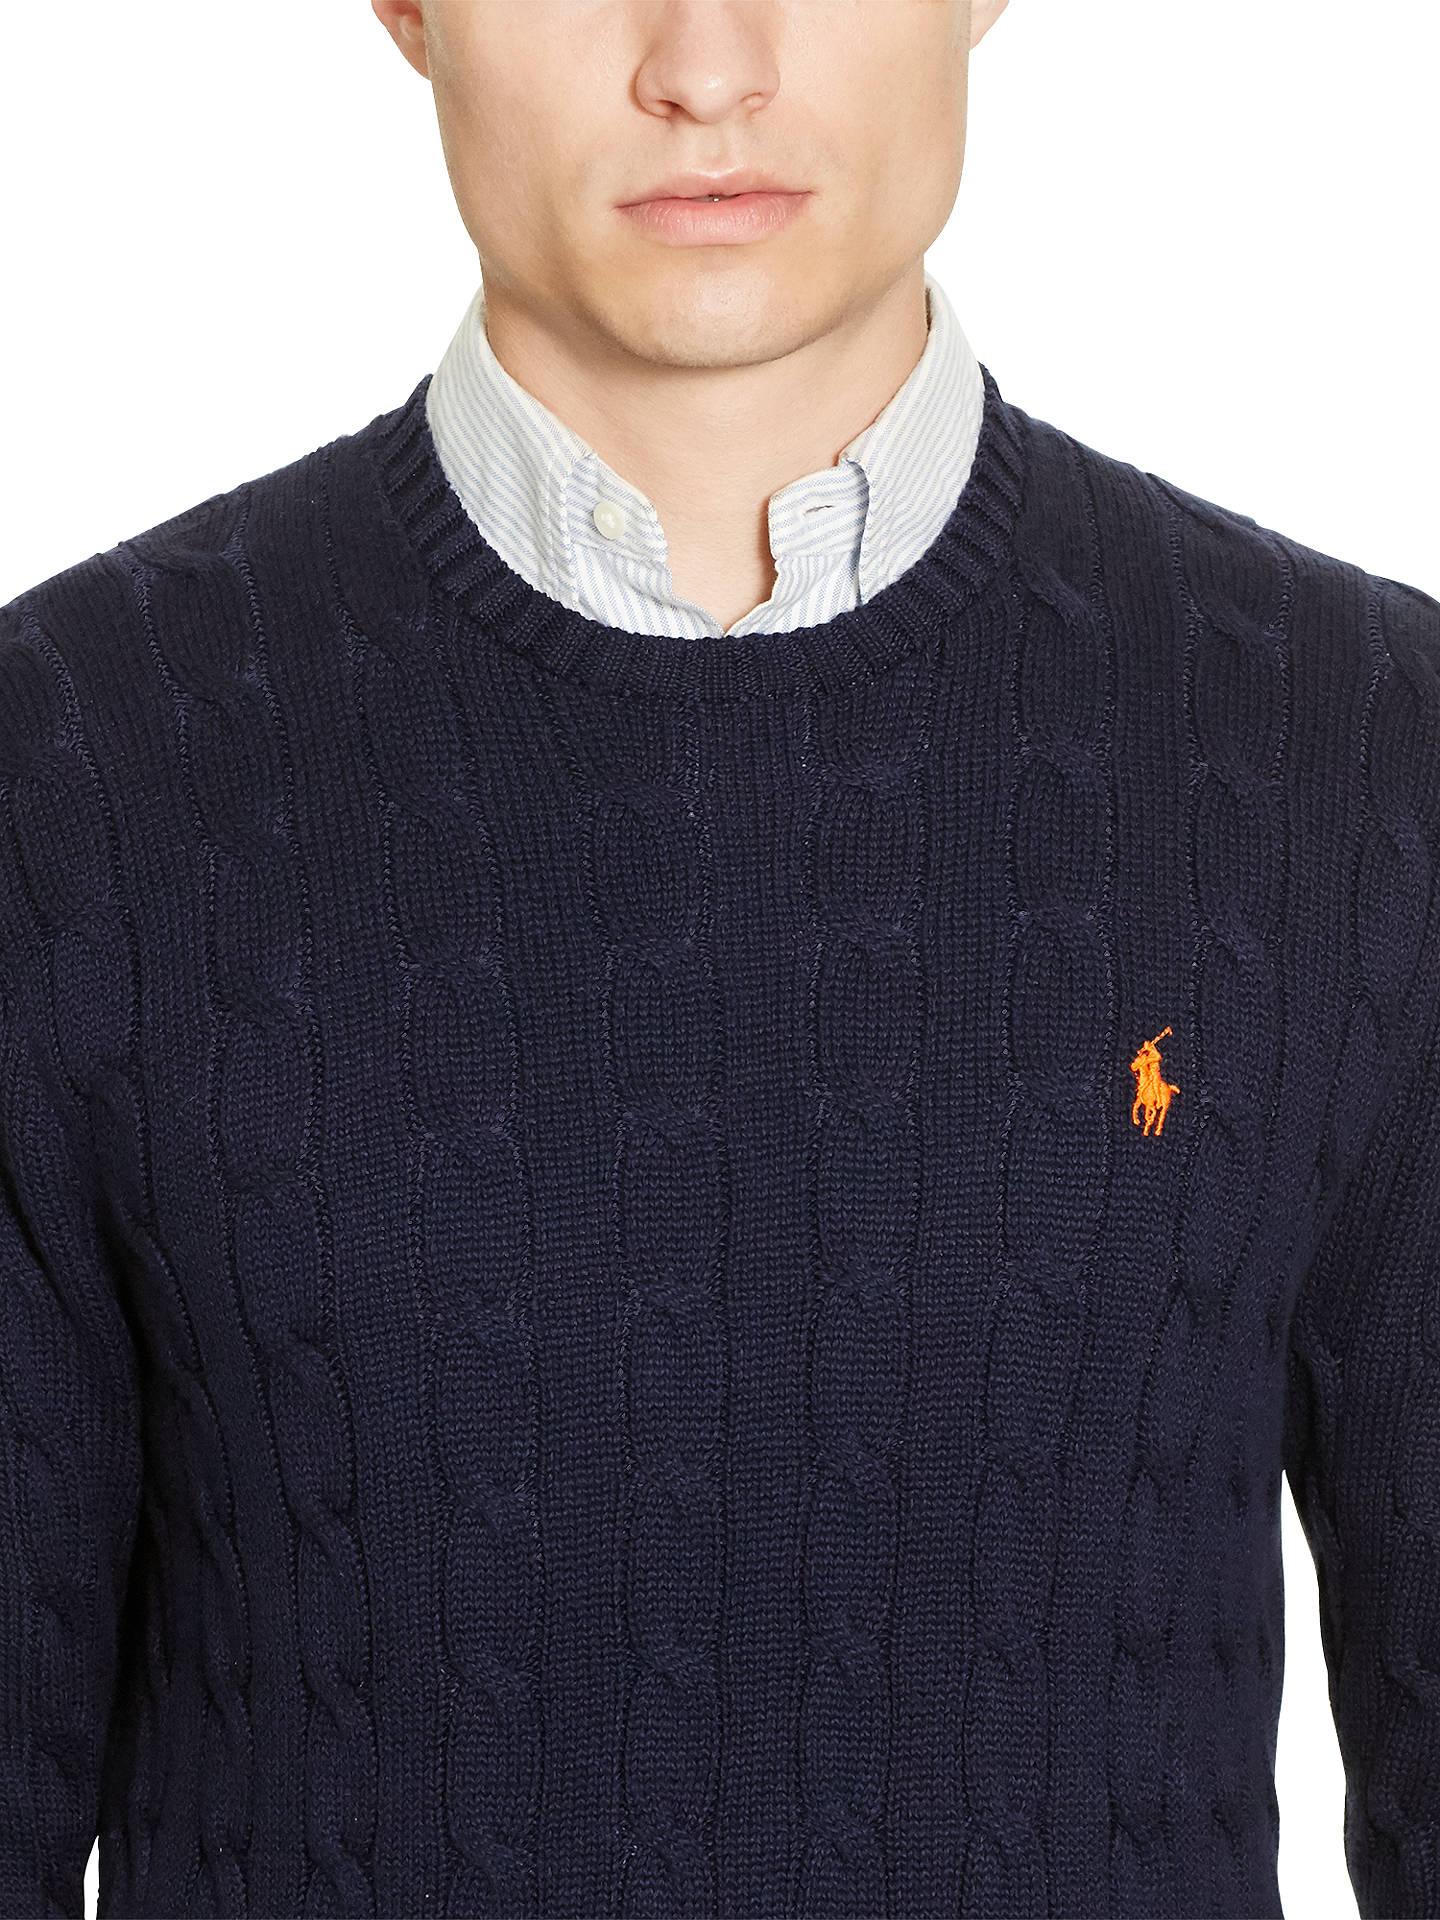 e84baf5e2 ... Buy Polo Ralph Lauren Cable Knit Crew Neck Jumper